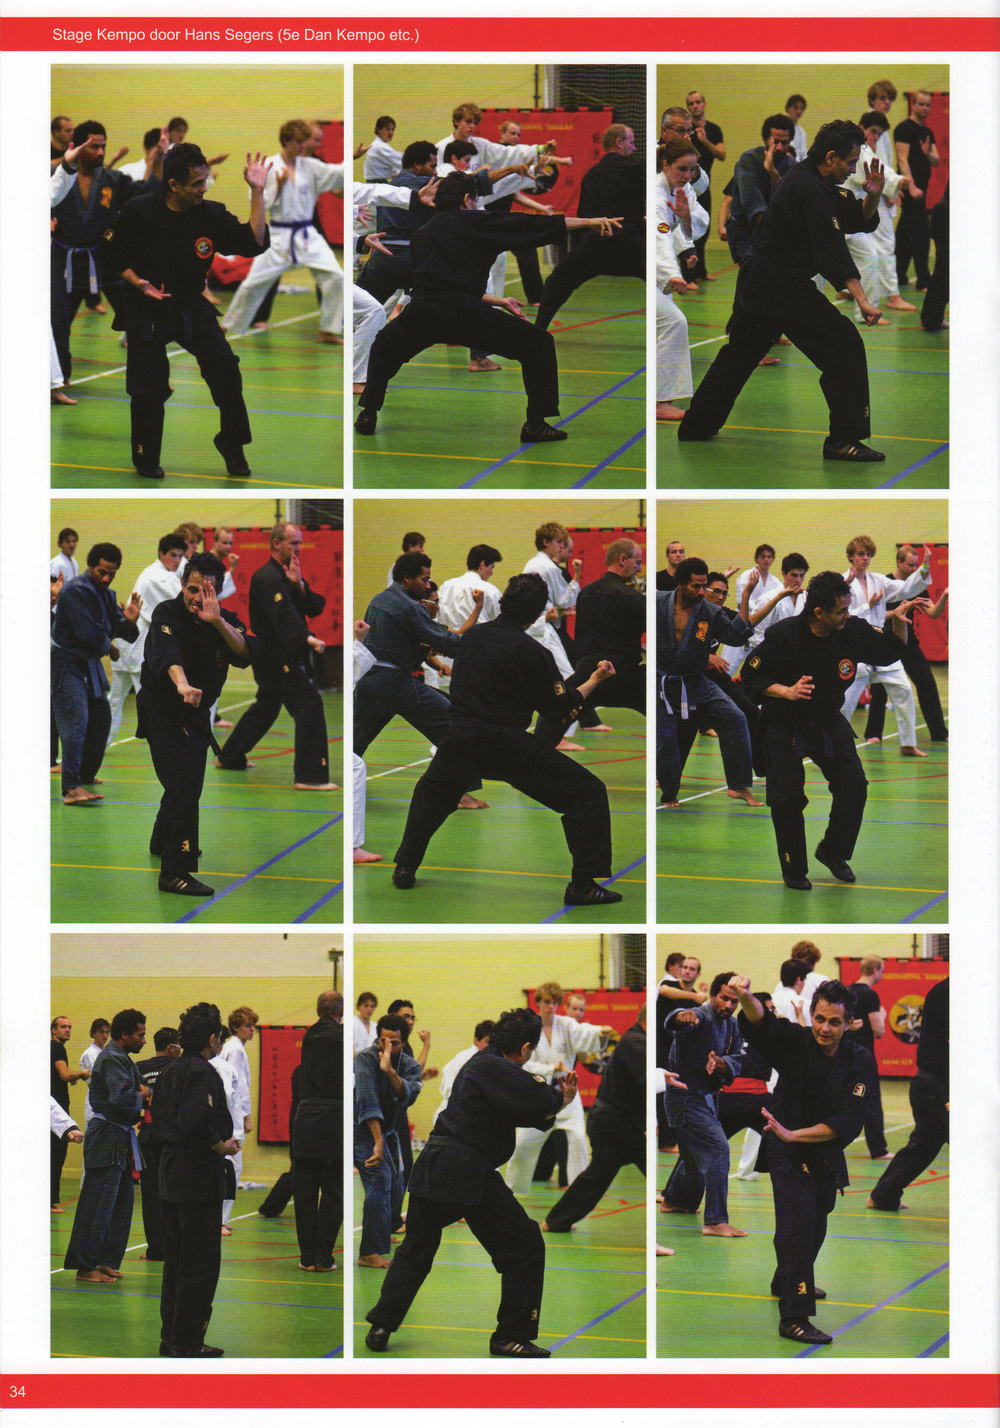 2012-11-04 NFK 7 Masters Martial Arts Festival Fotomagazine 2012 Pagina 34.jpg